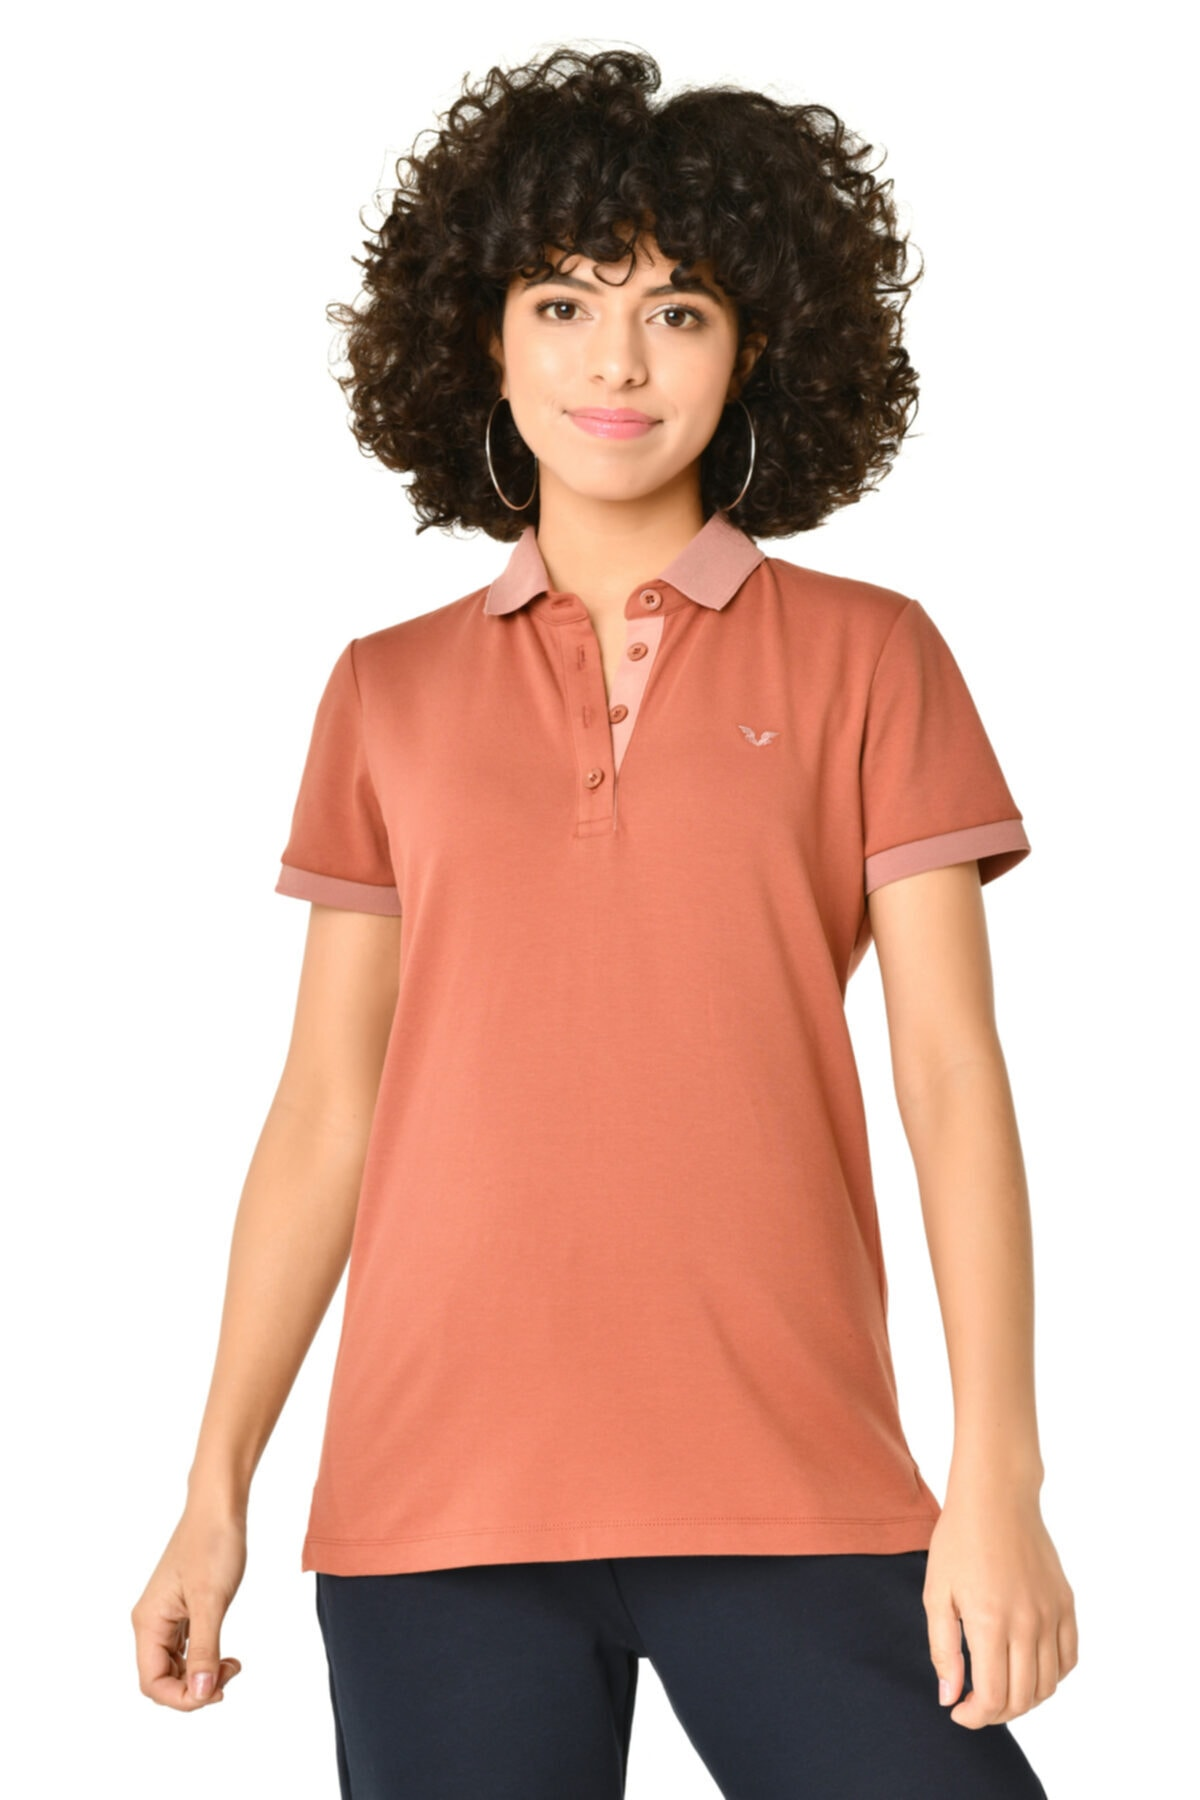 bilcee Kadın Toprak Polo Yaka Tshirt Hs-8719 1